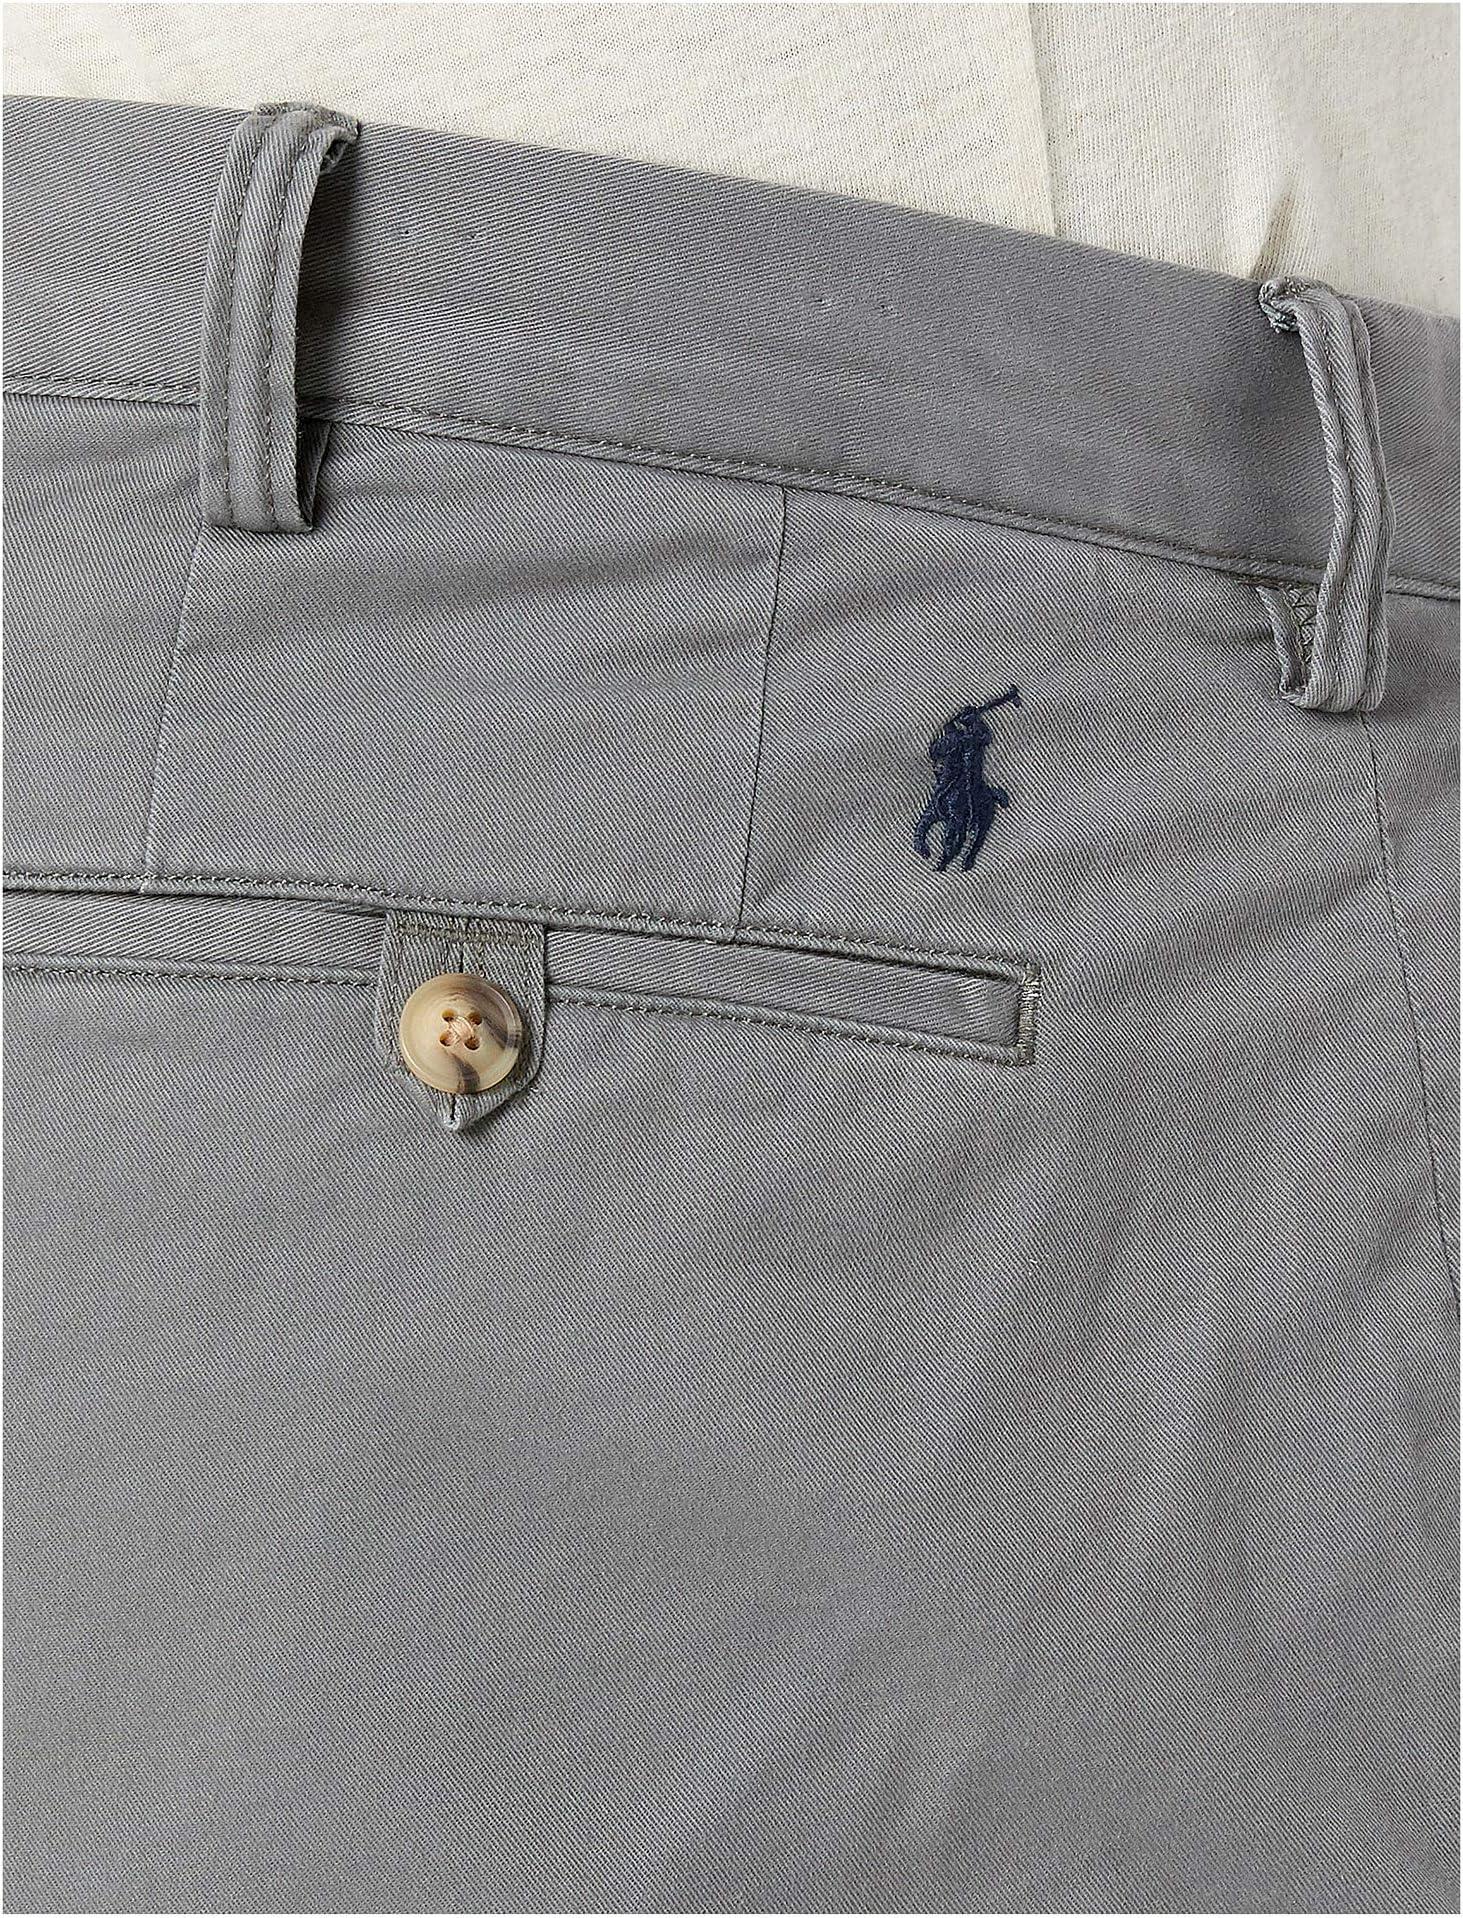 Polo Ralph Lauren Big & Tall Stretch Chino Pants 21rmN